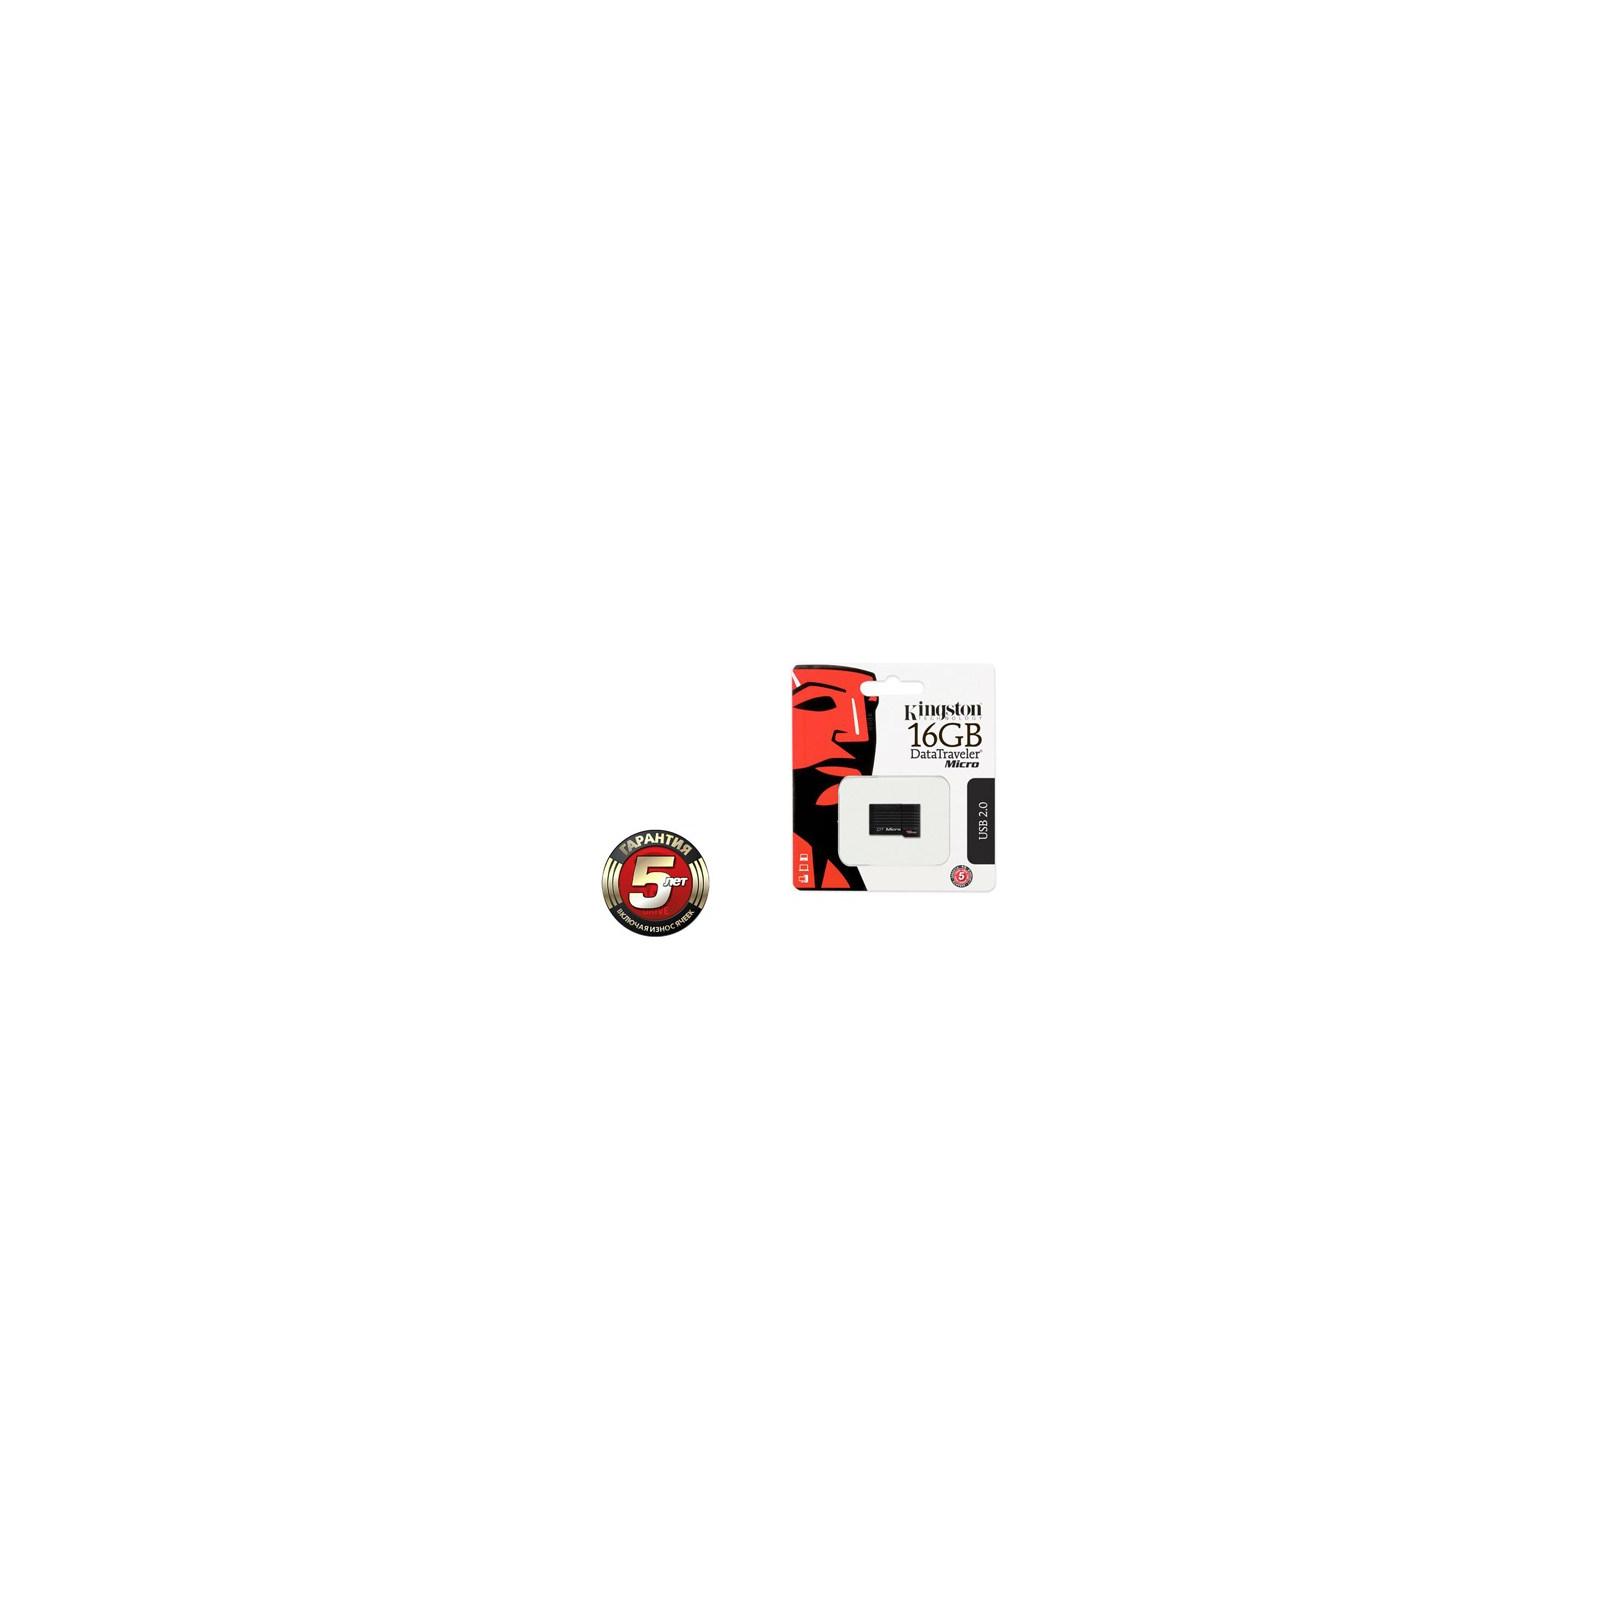 USB флеш накопитель Kingston 16Gb DataTraveler DTMC Black (DTMCK/16GB) изображение 3